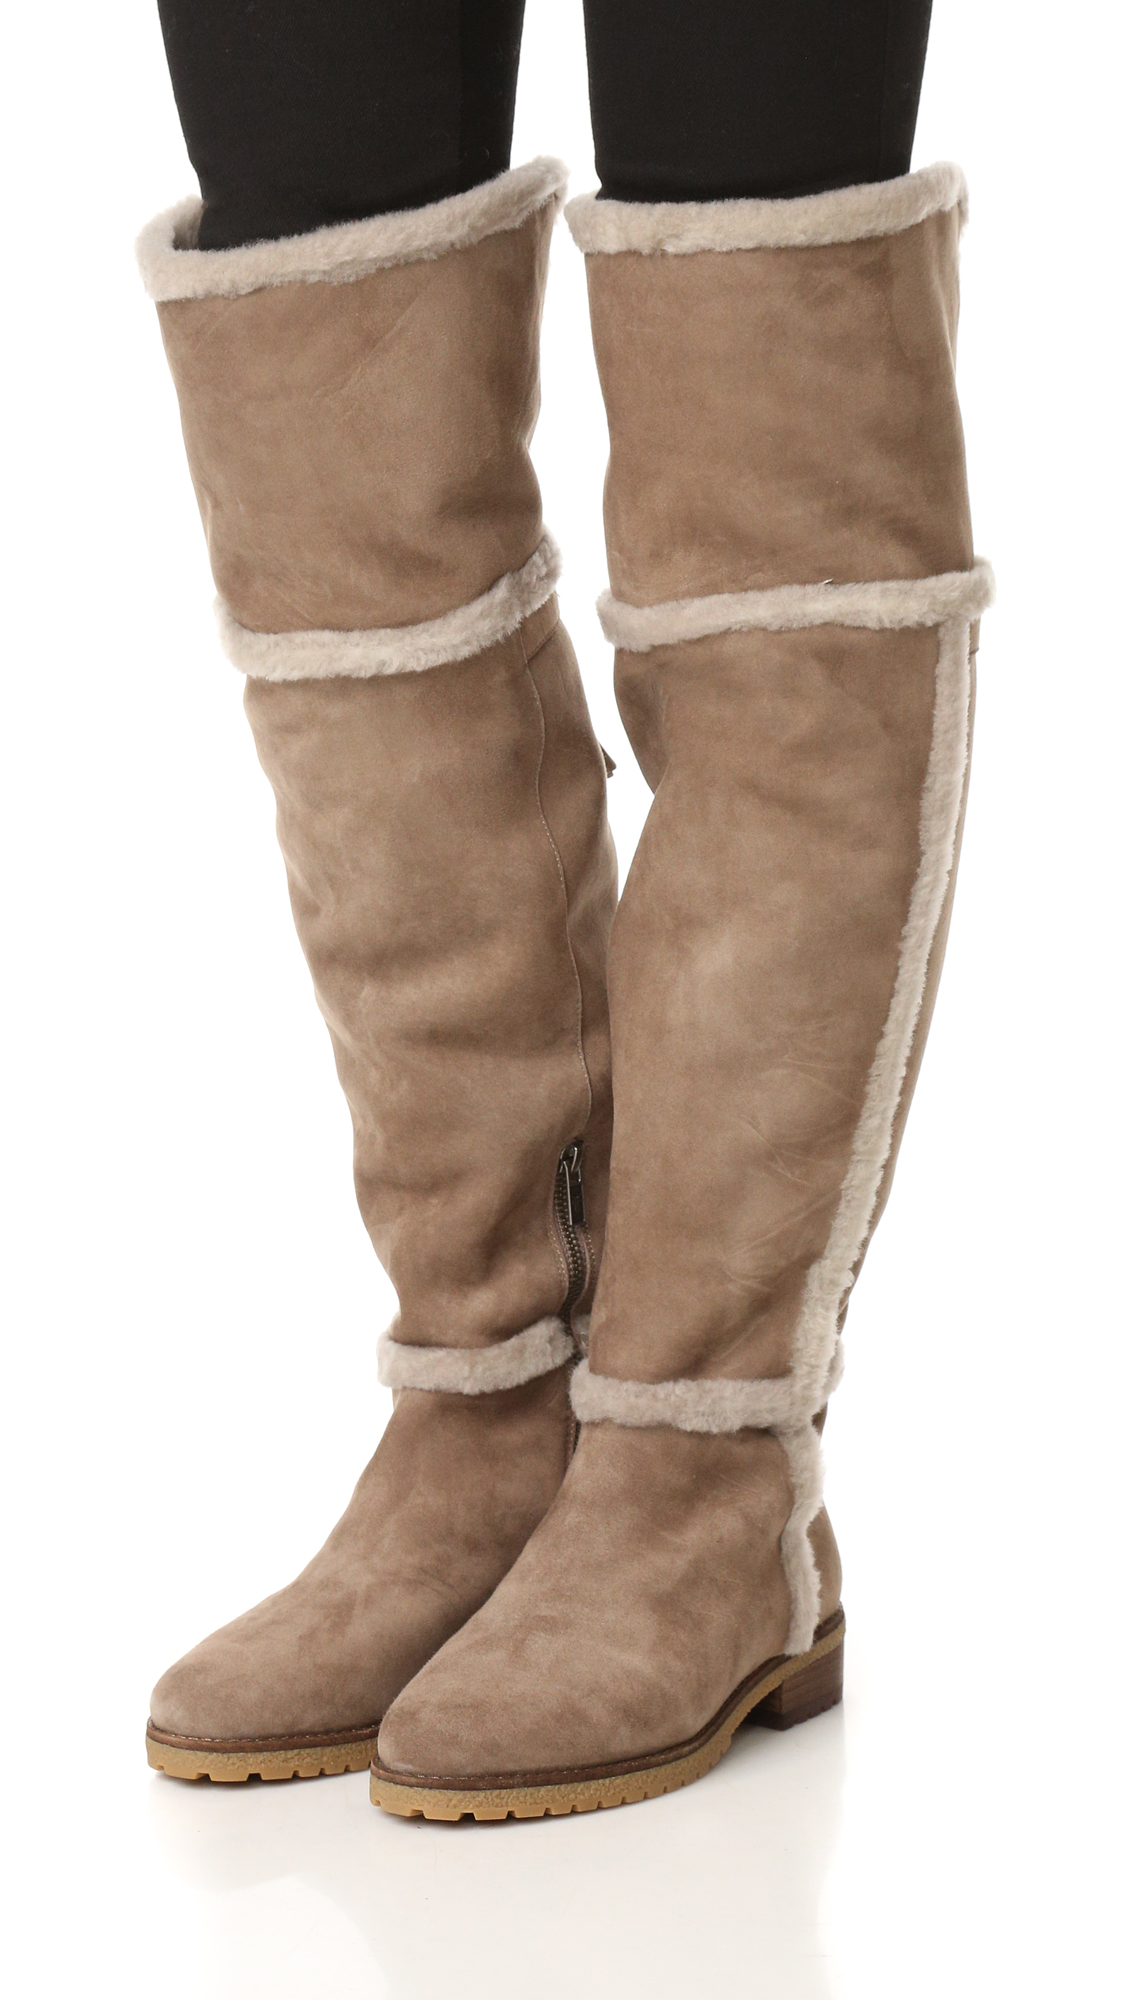 389d0c28cd6 Frye Tamara Shearling Over The Knee Boots